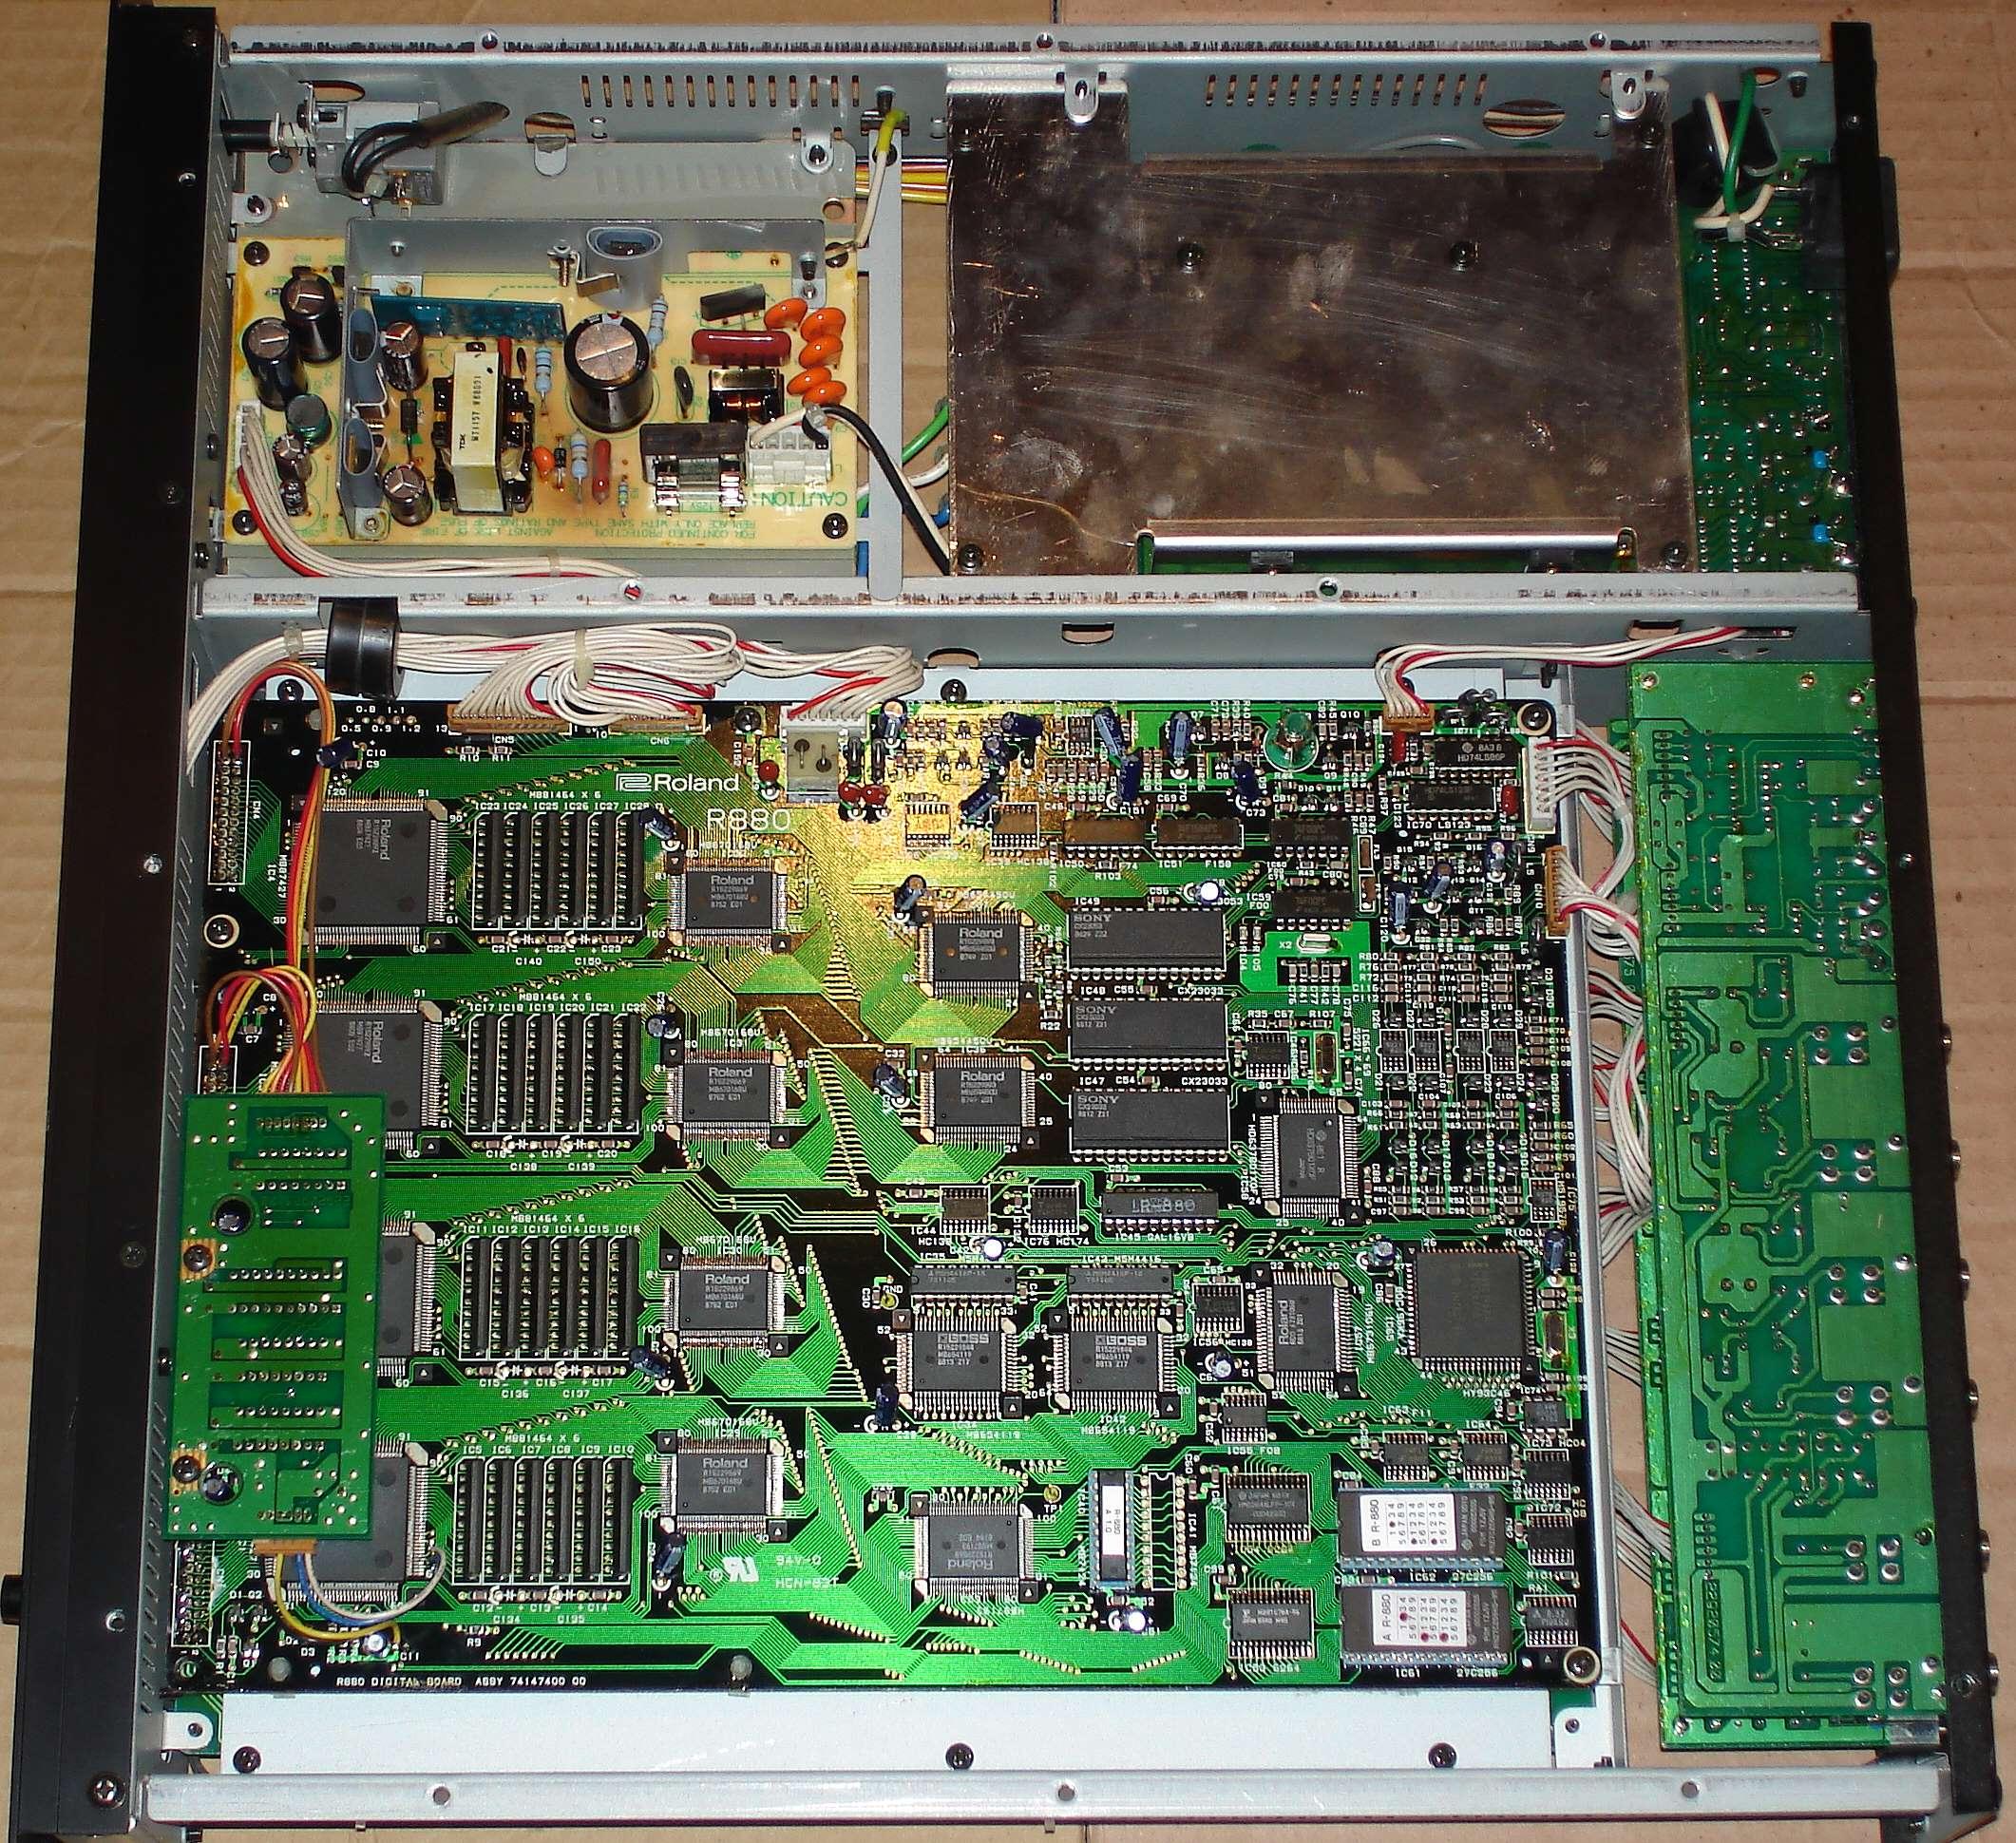 roland r880 480l presets page 2 gearslutz pro audio community rh gearslutz com Roland KC-880 Roland MC-808